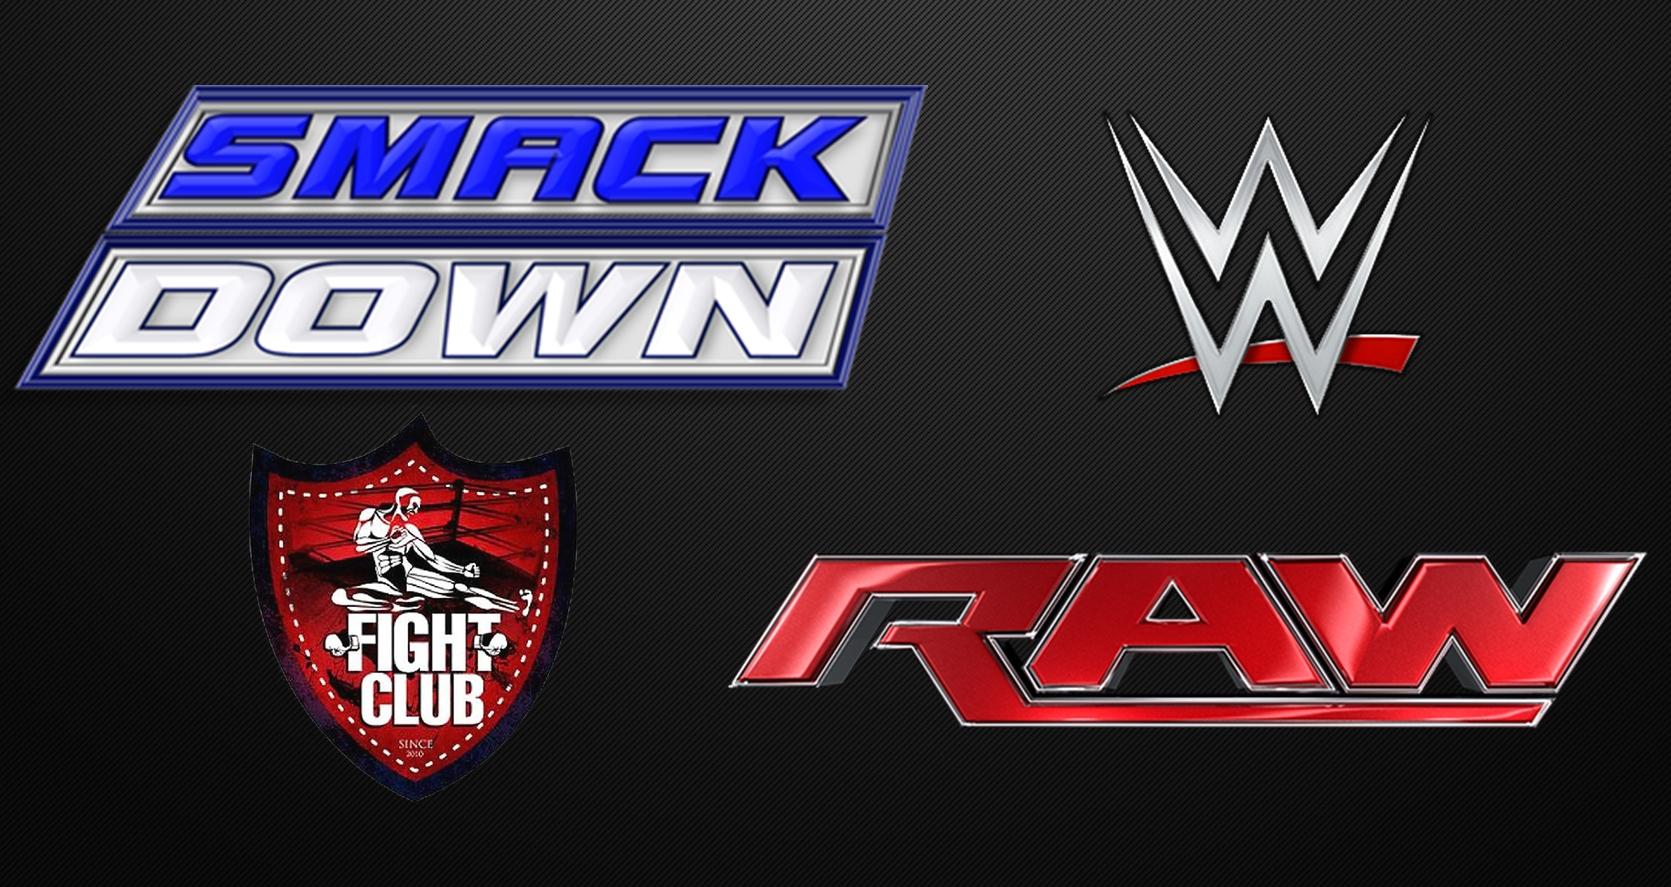 Smackdown Raw 2015 Logo